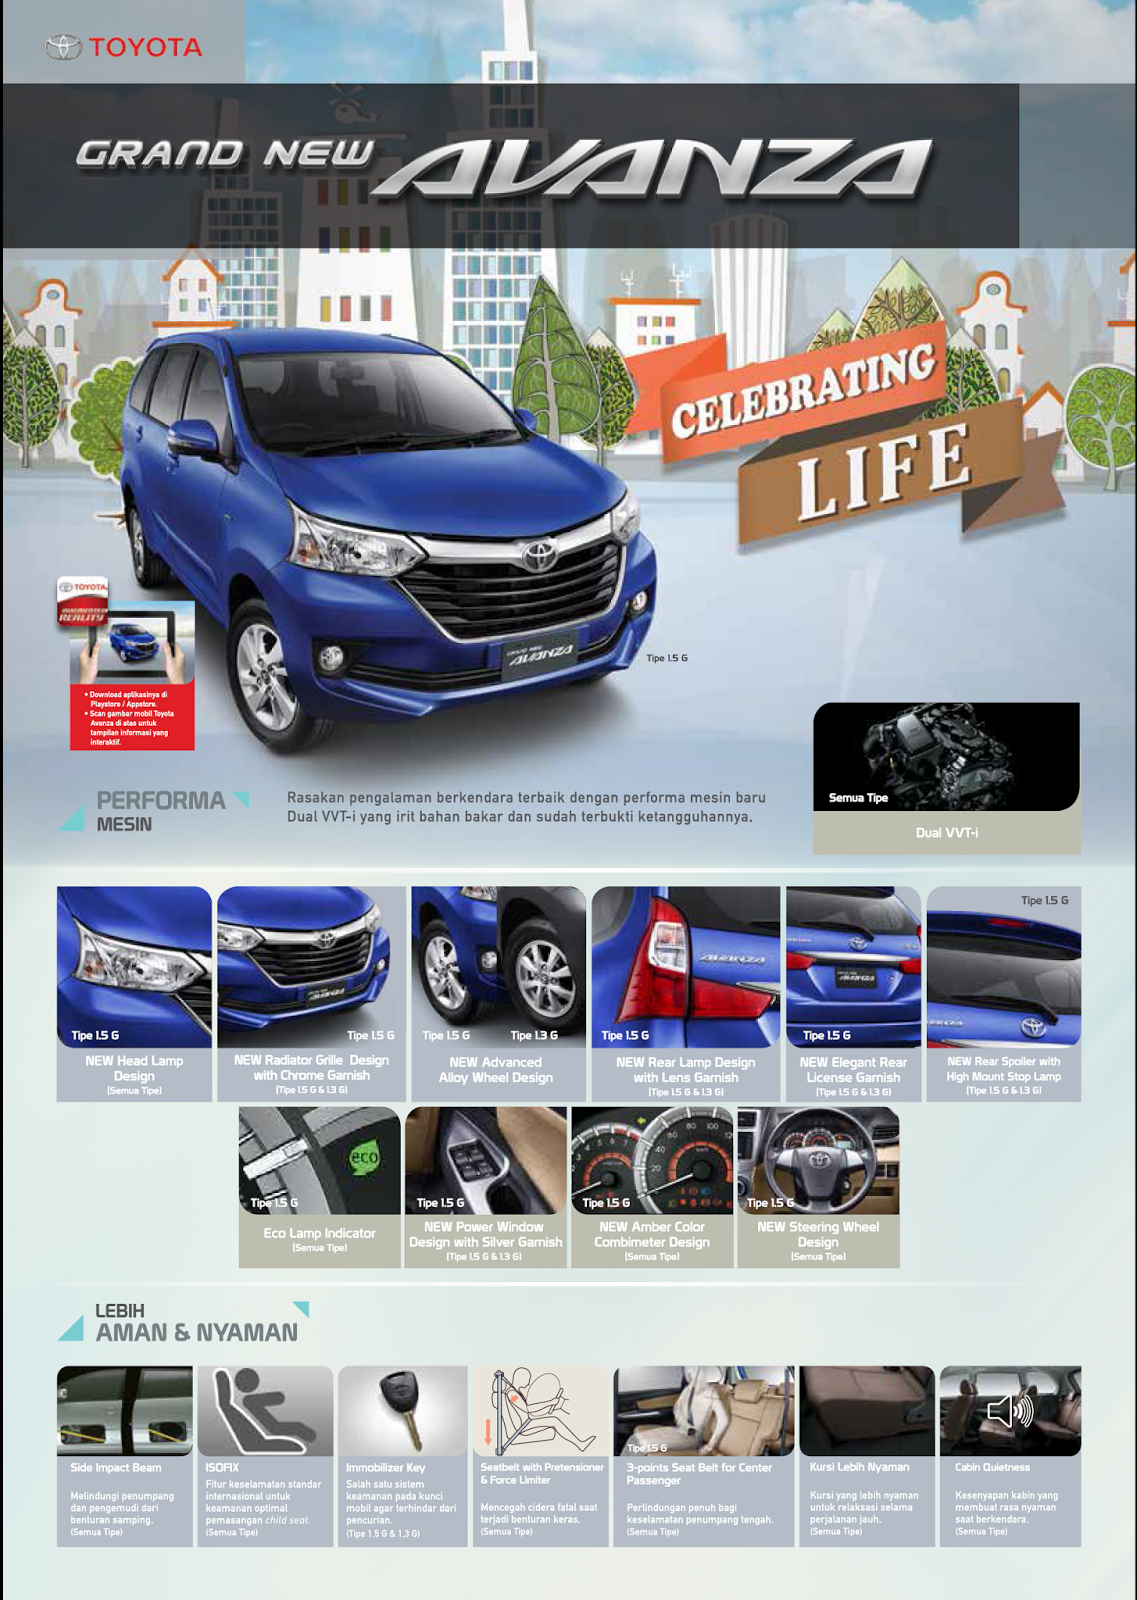 spesifikasi grand new avanza 2018 veloz 1.3 brosur 2016 harga toyota auto 2000